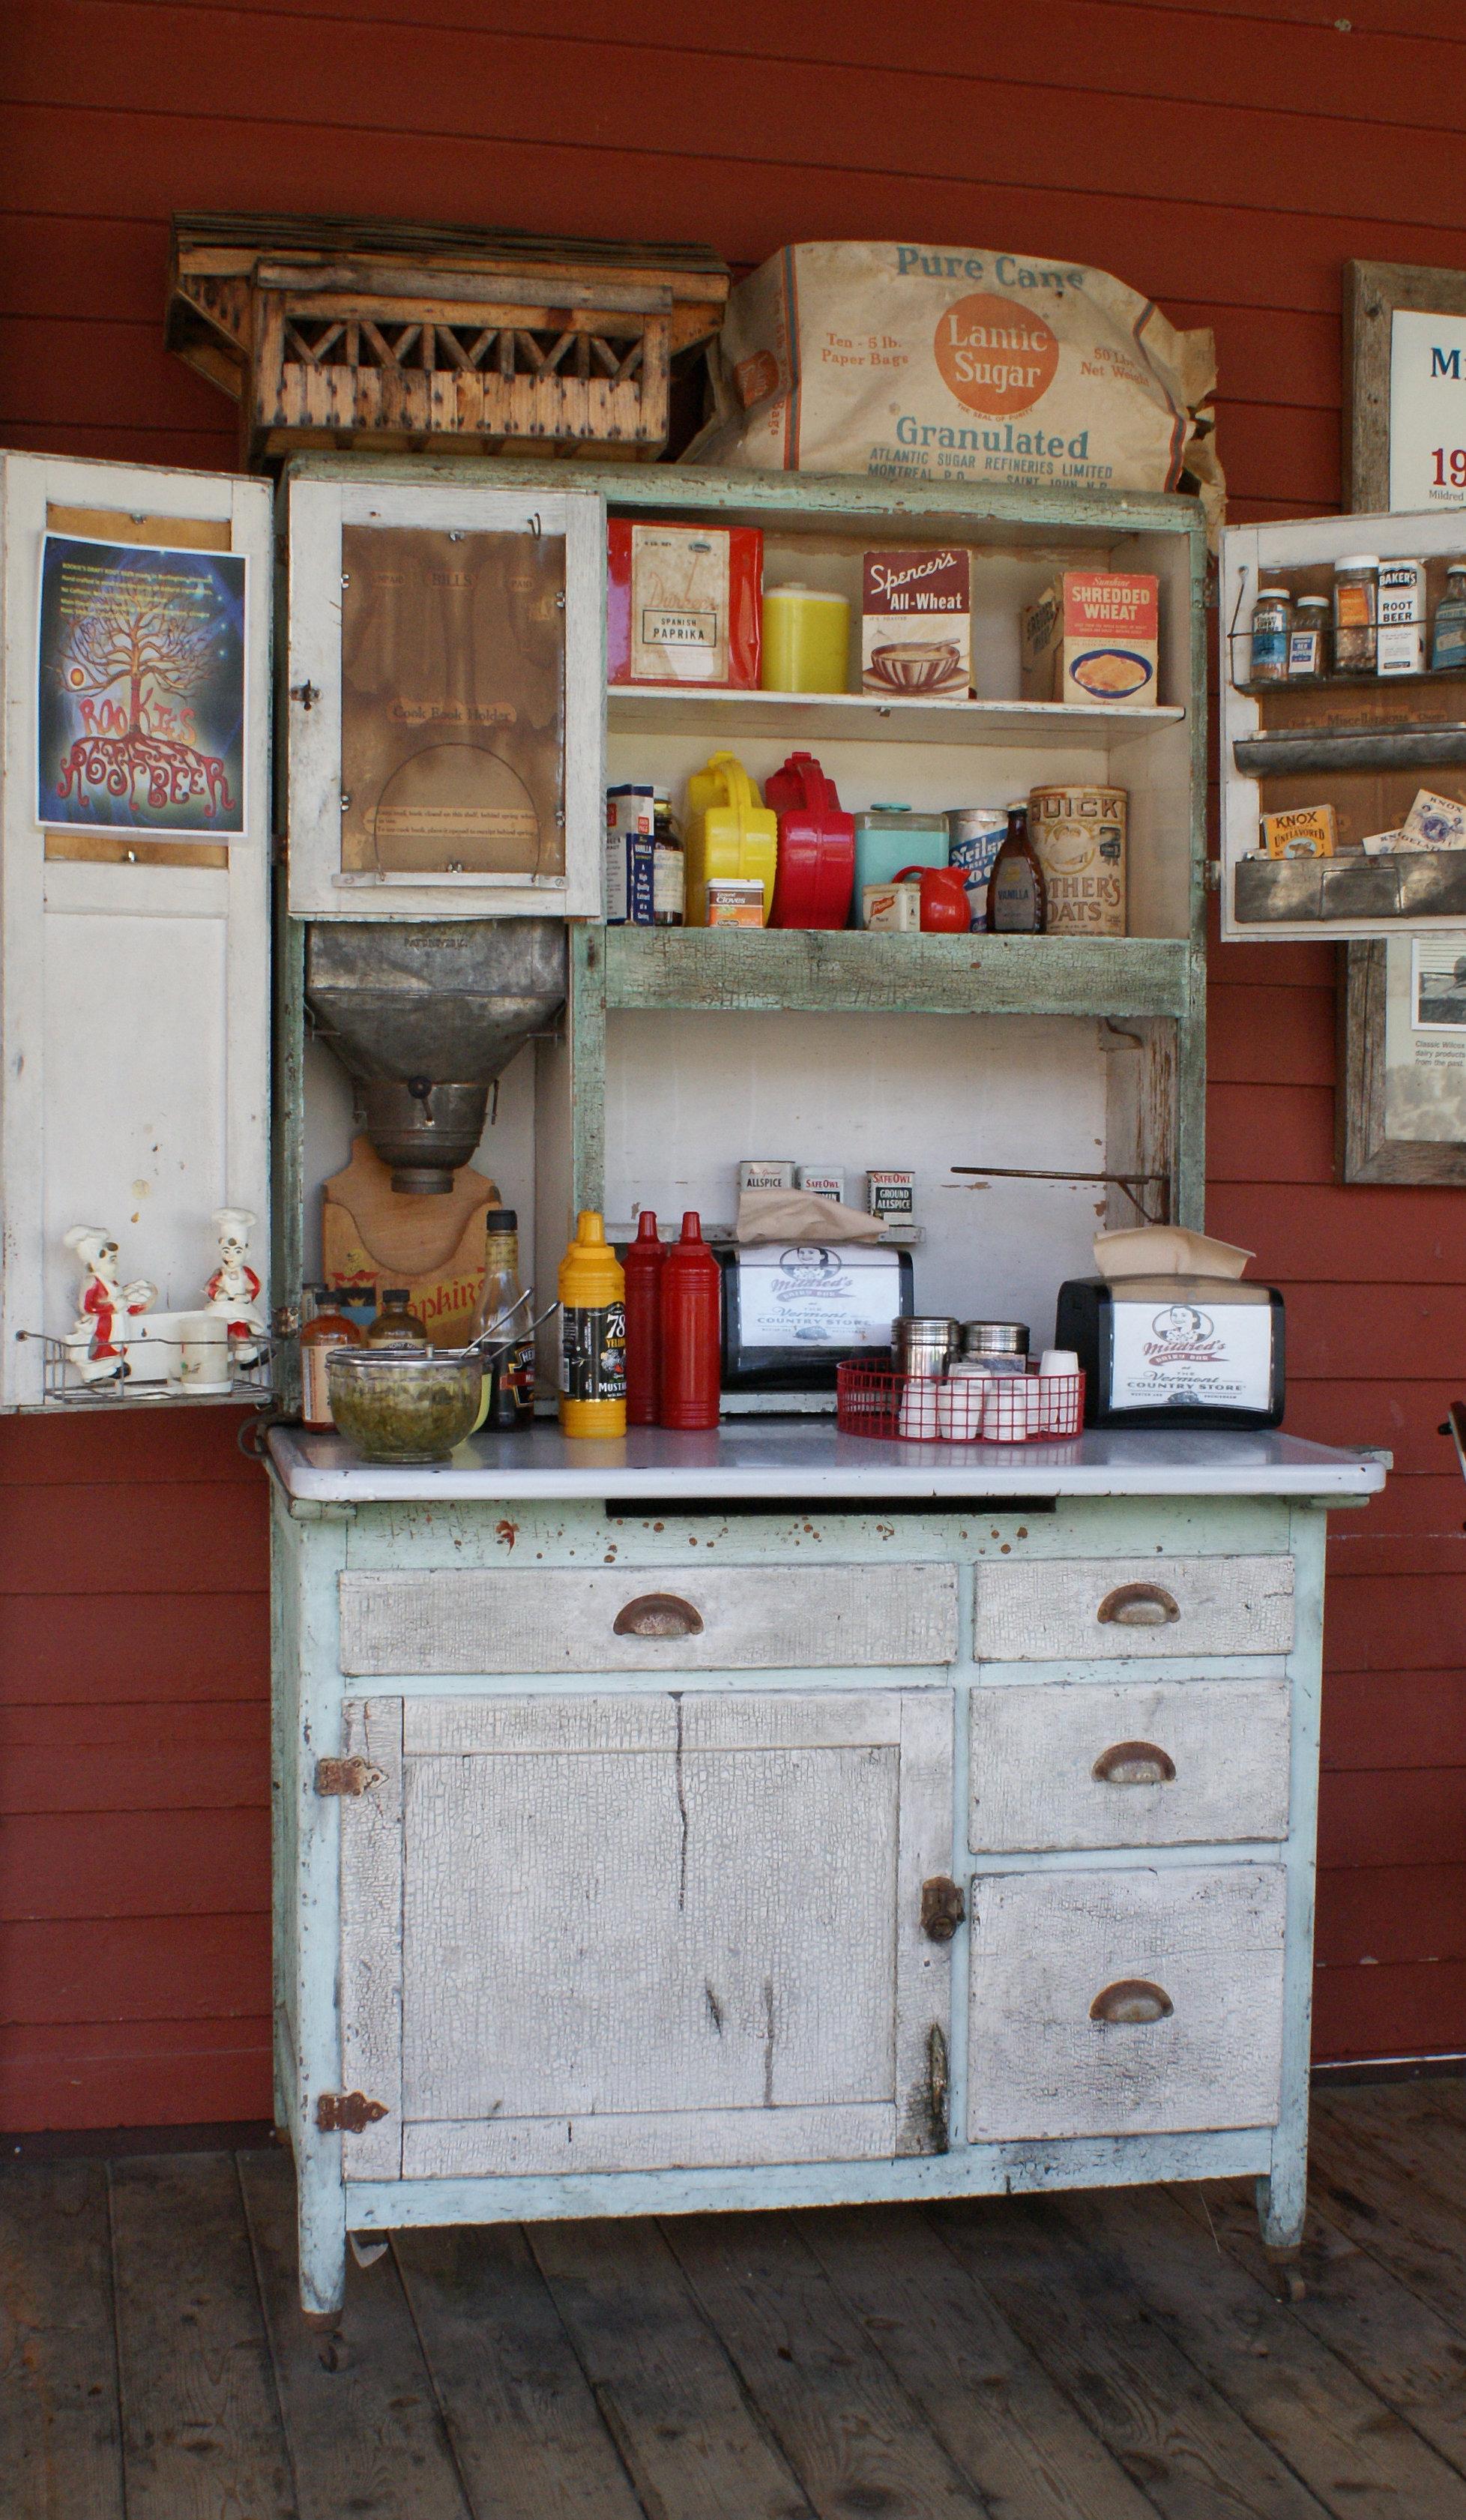 File:Vintage Kitchen Baking Cabinet And Storage Unit   DSC02663